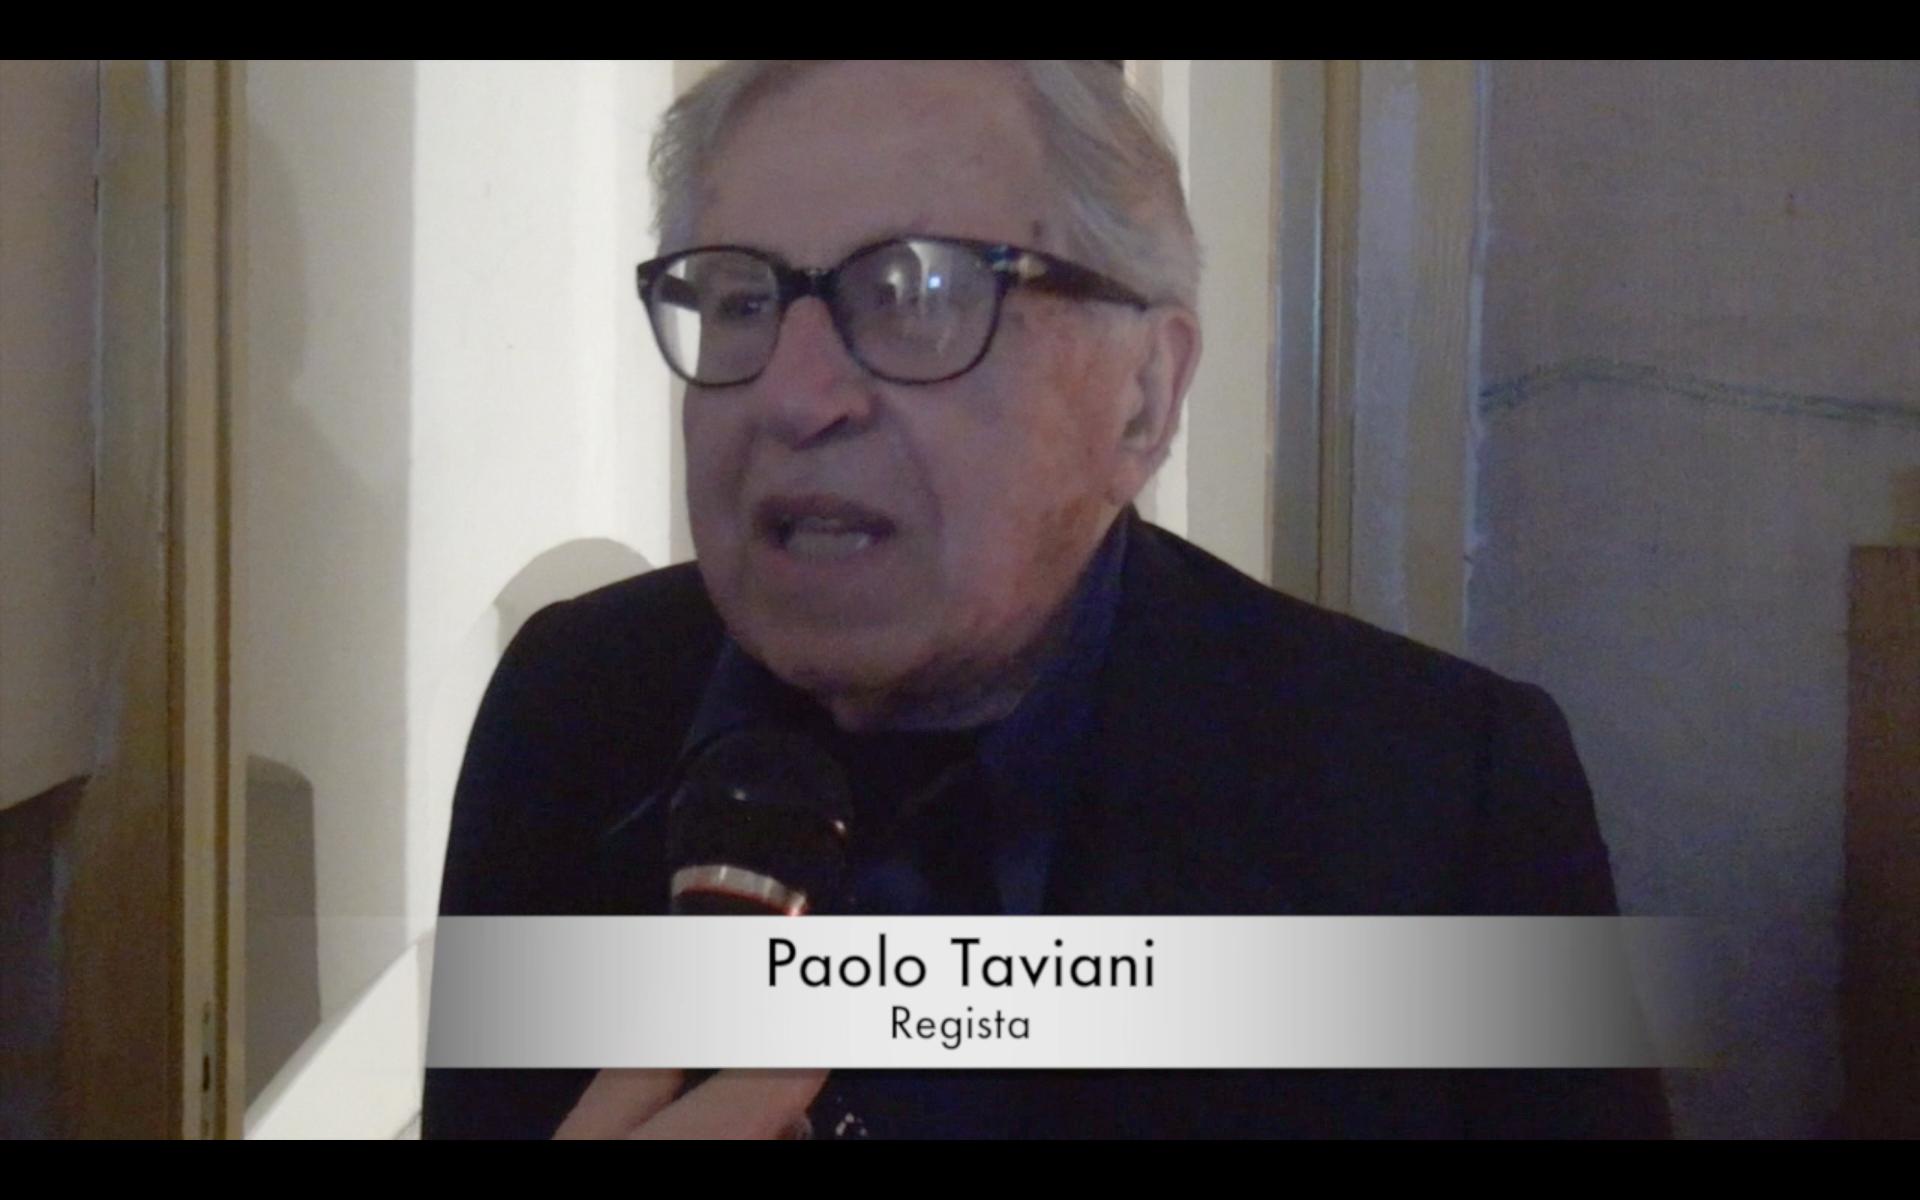 http://Paolo%20Taviani